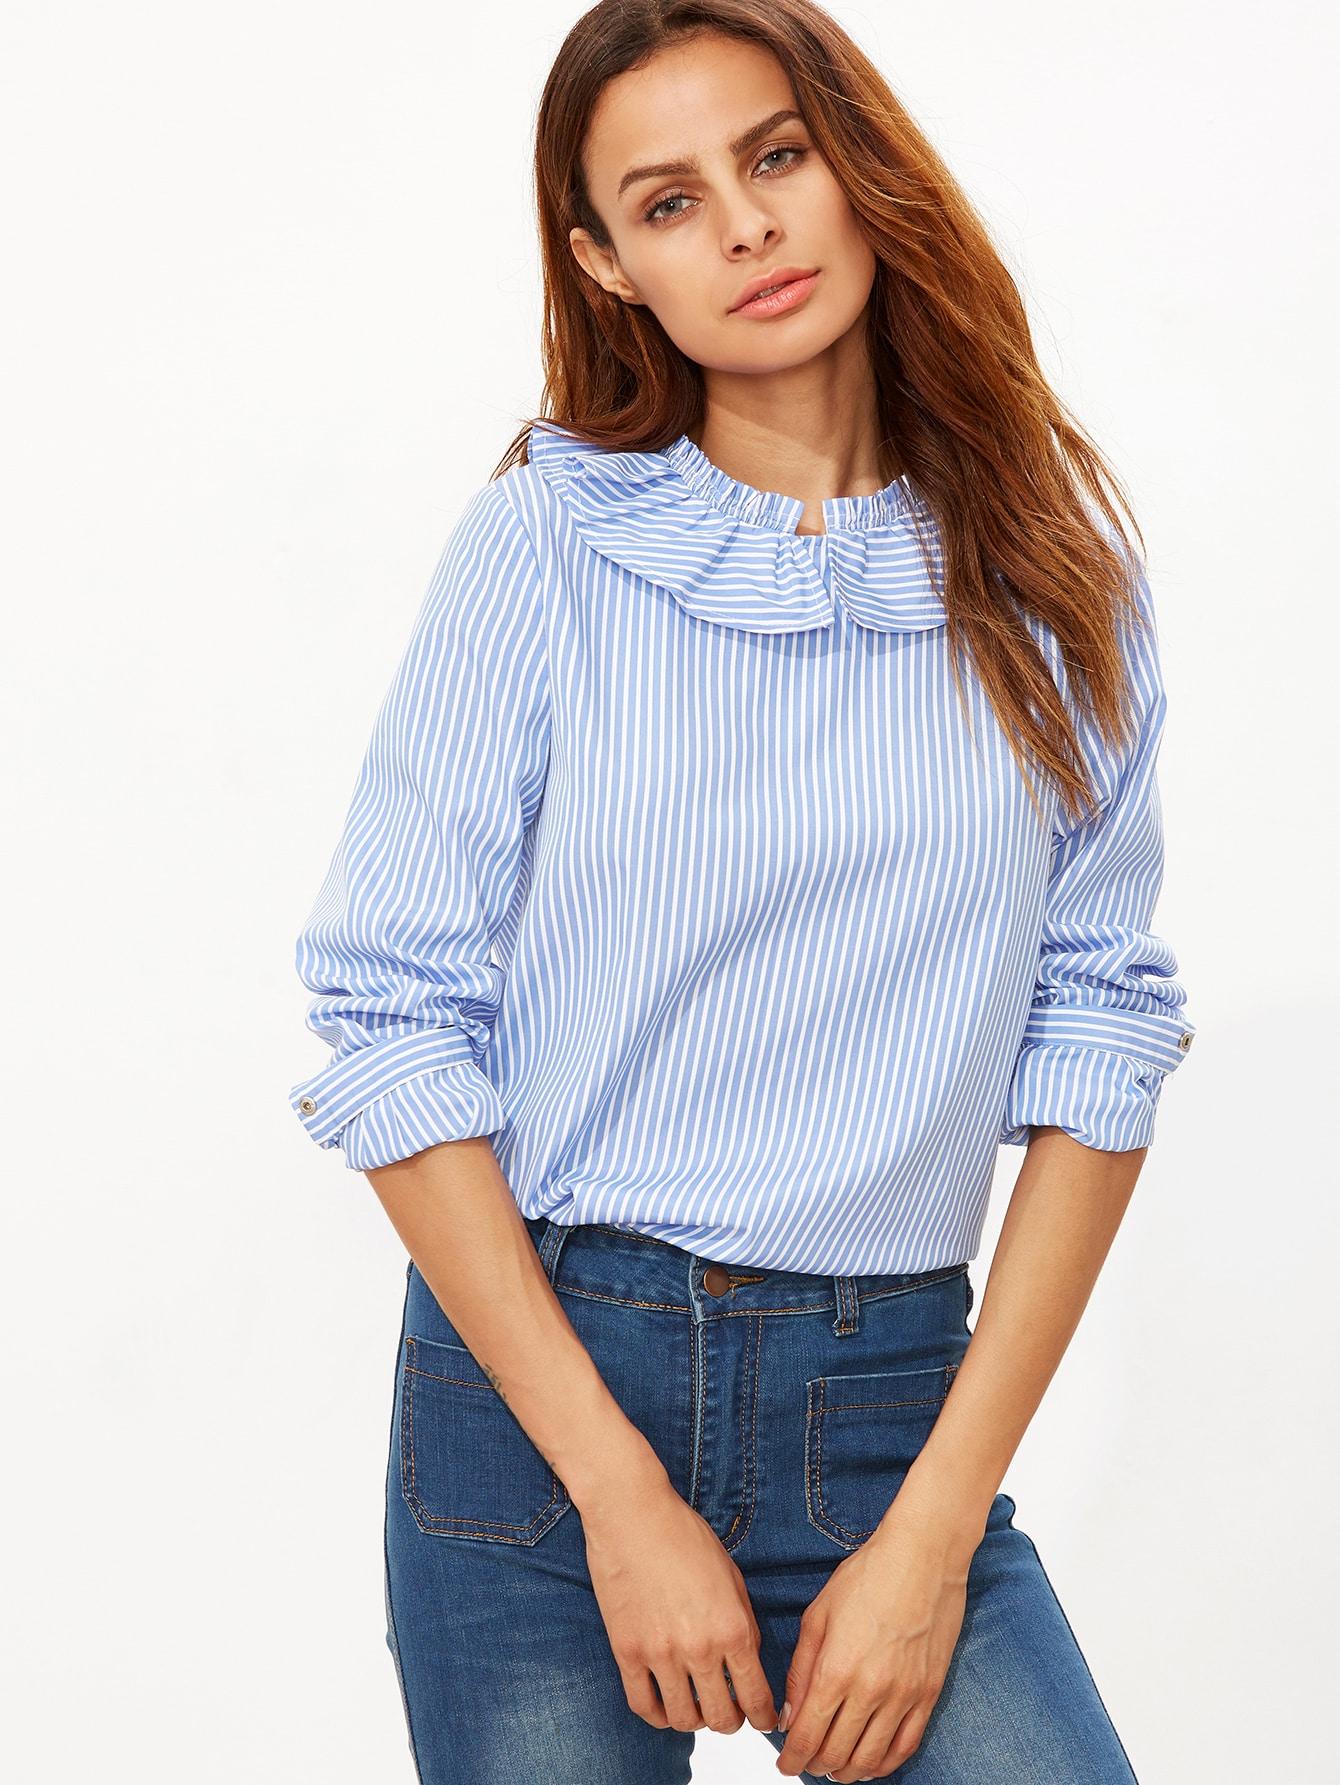 02a8a80094f Blue Striped Ruffle Collar Button Back Blouse EmmaCloth-Women Fast ...